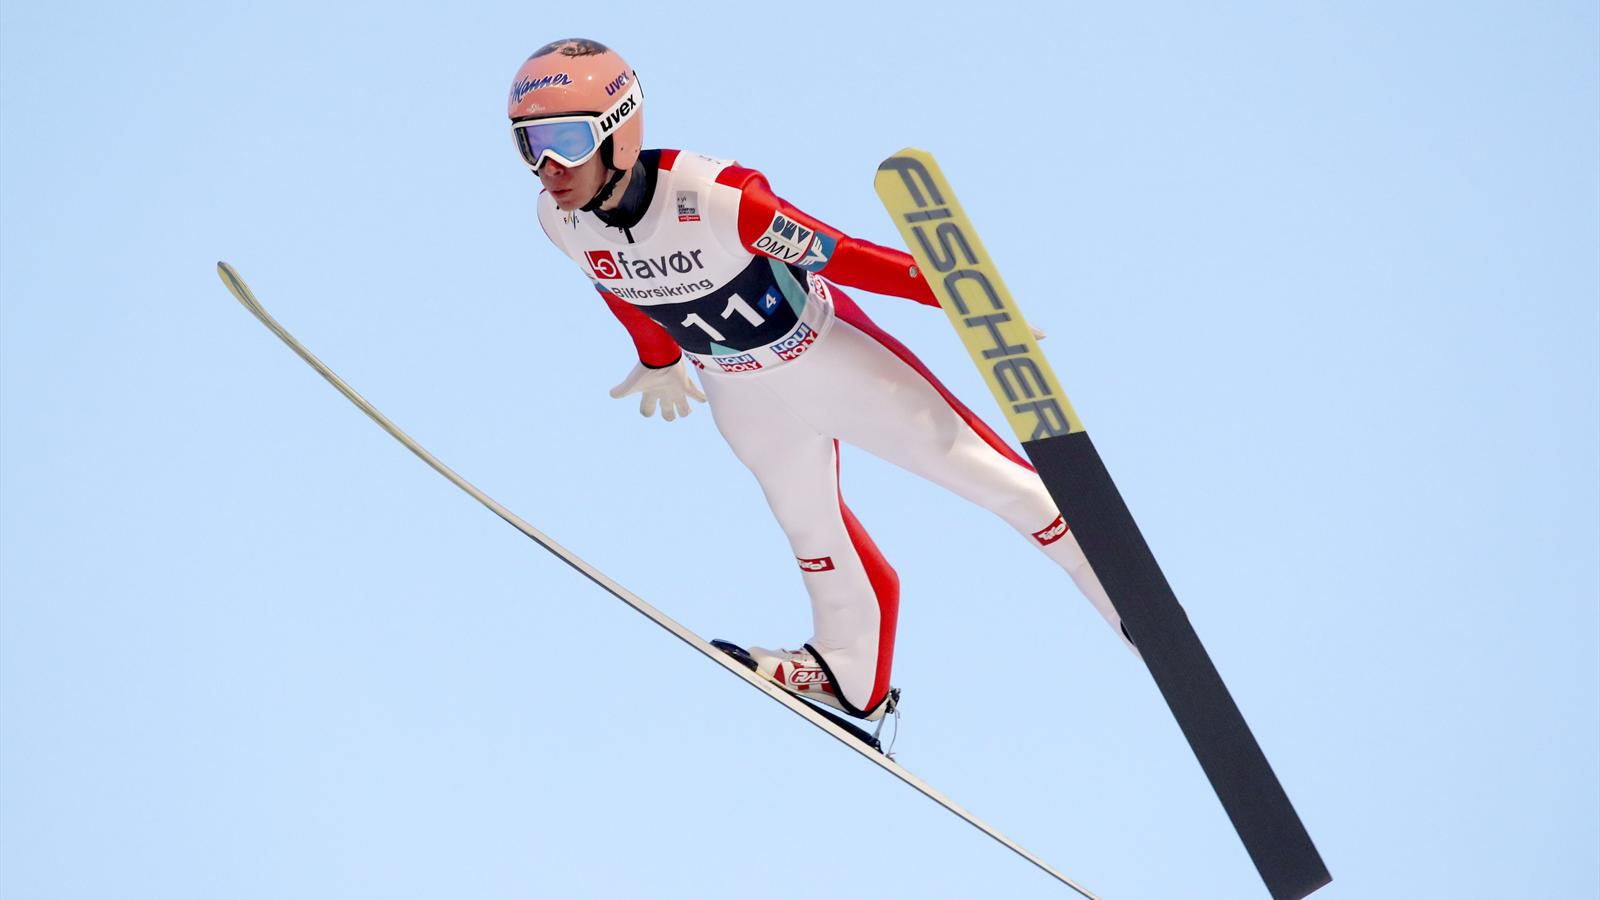 World record broken twice as Norway claim team World Cup gold - Ski Jumping - Eurosport